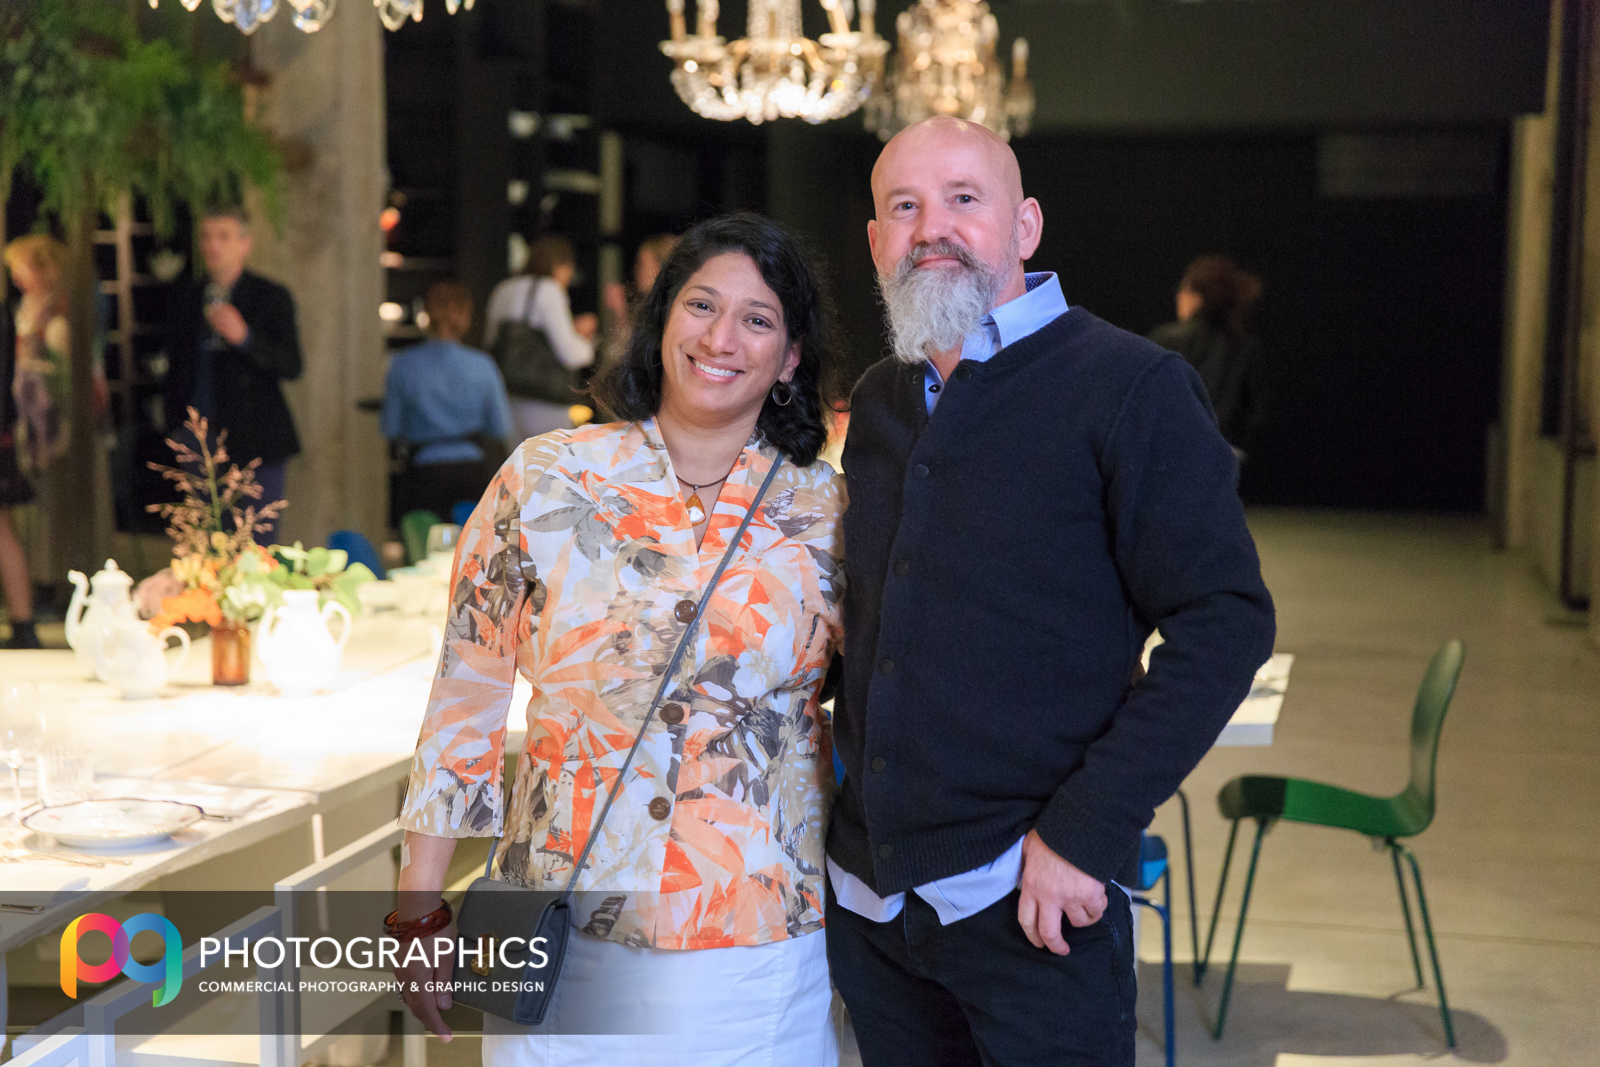 ESCR-2018-conference-event-photography-UK-glasgow-edinburgh-35.jpg